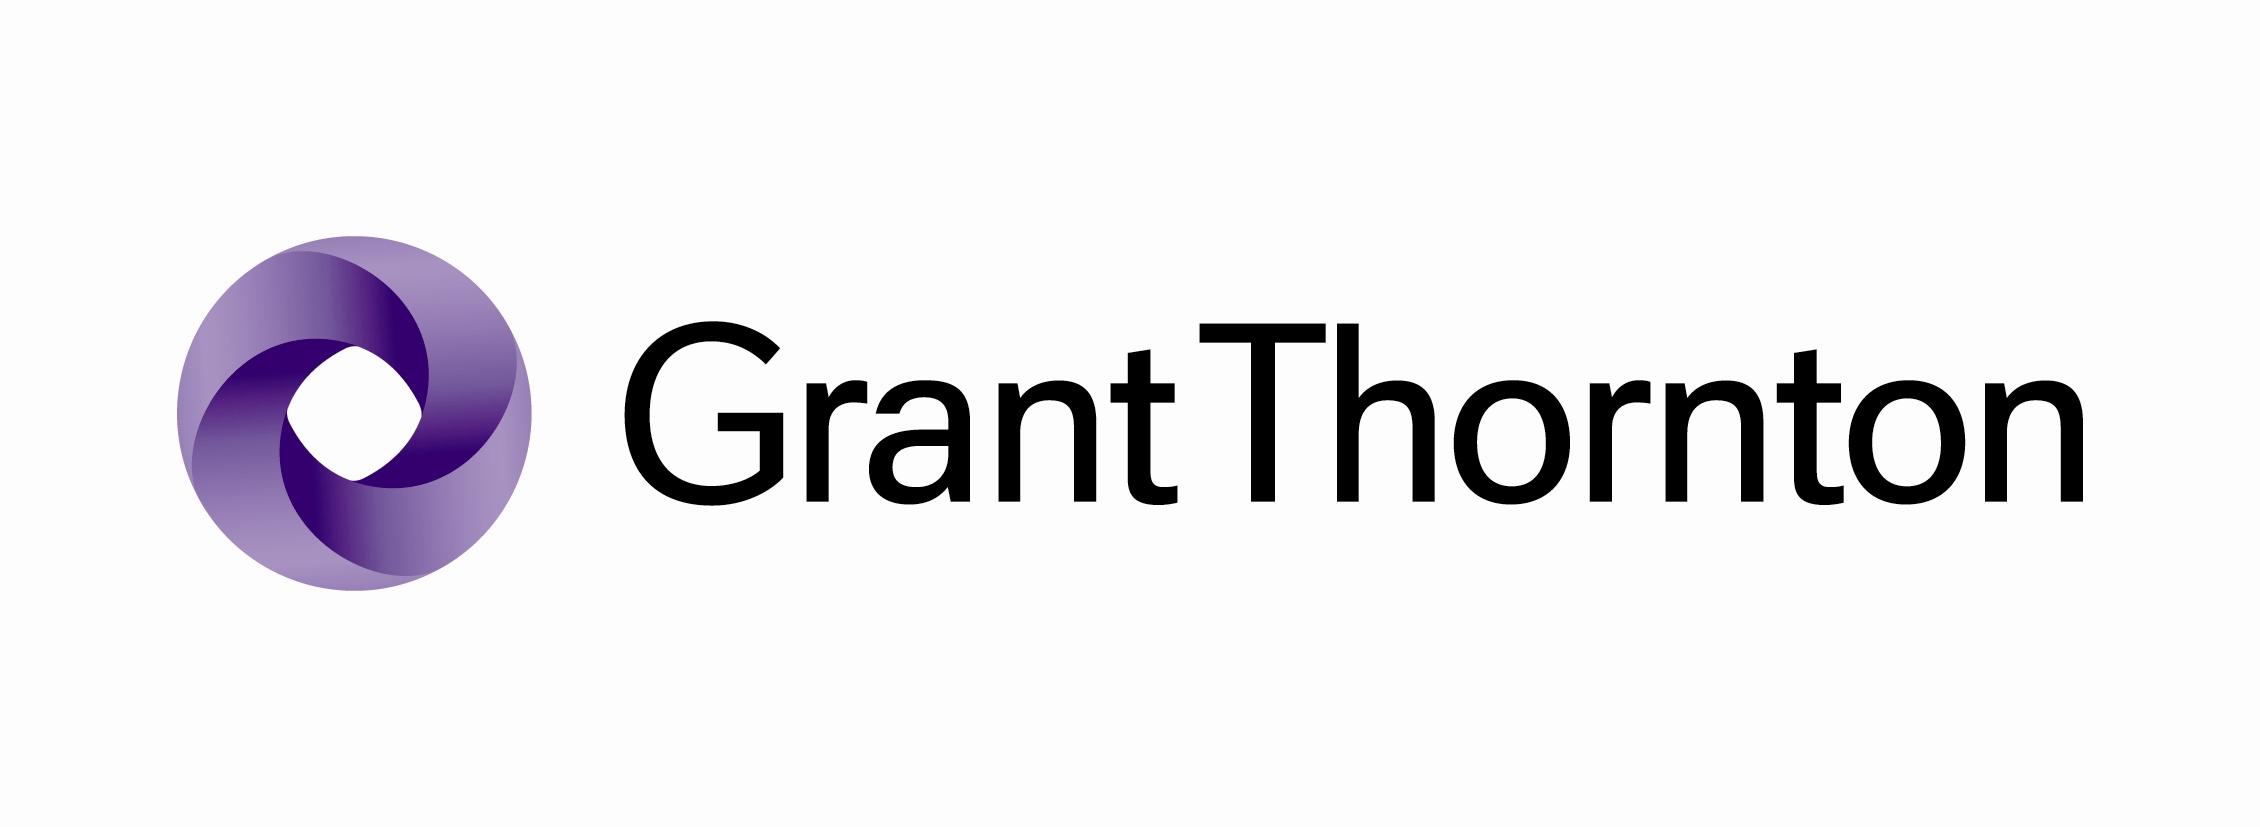 Grant_Thornton_Logo.jpg